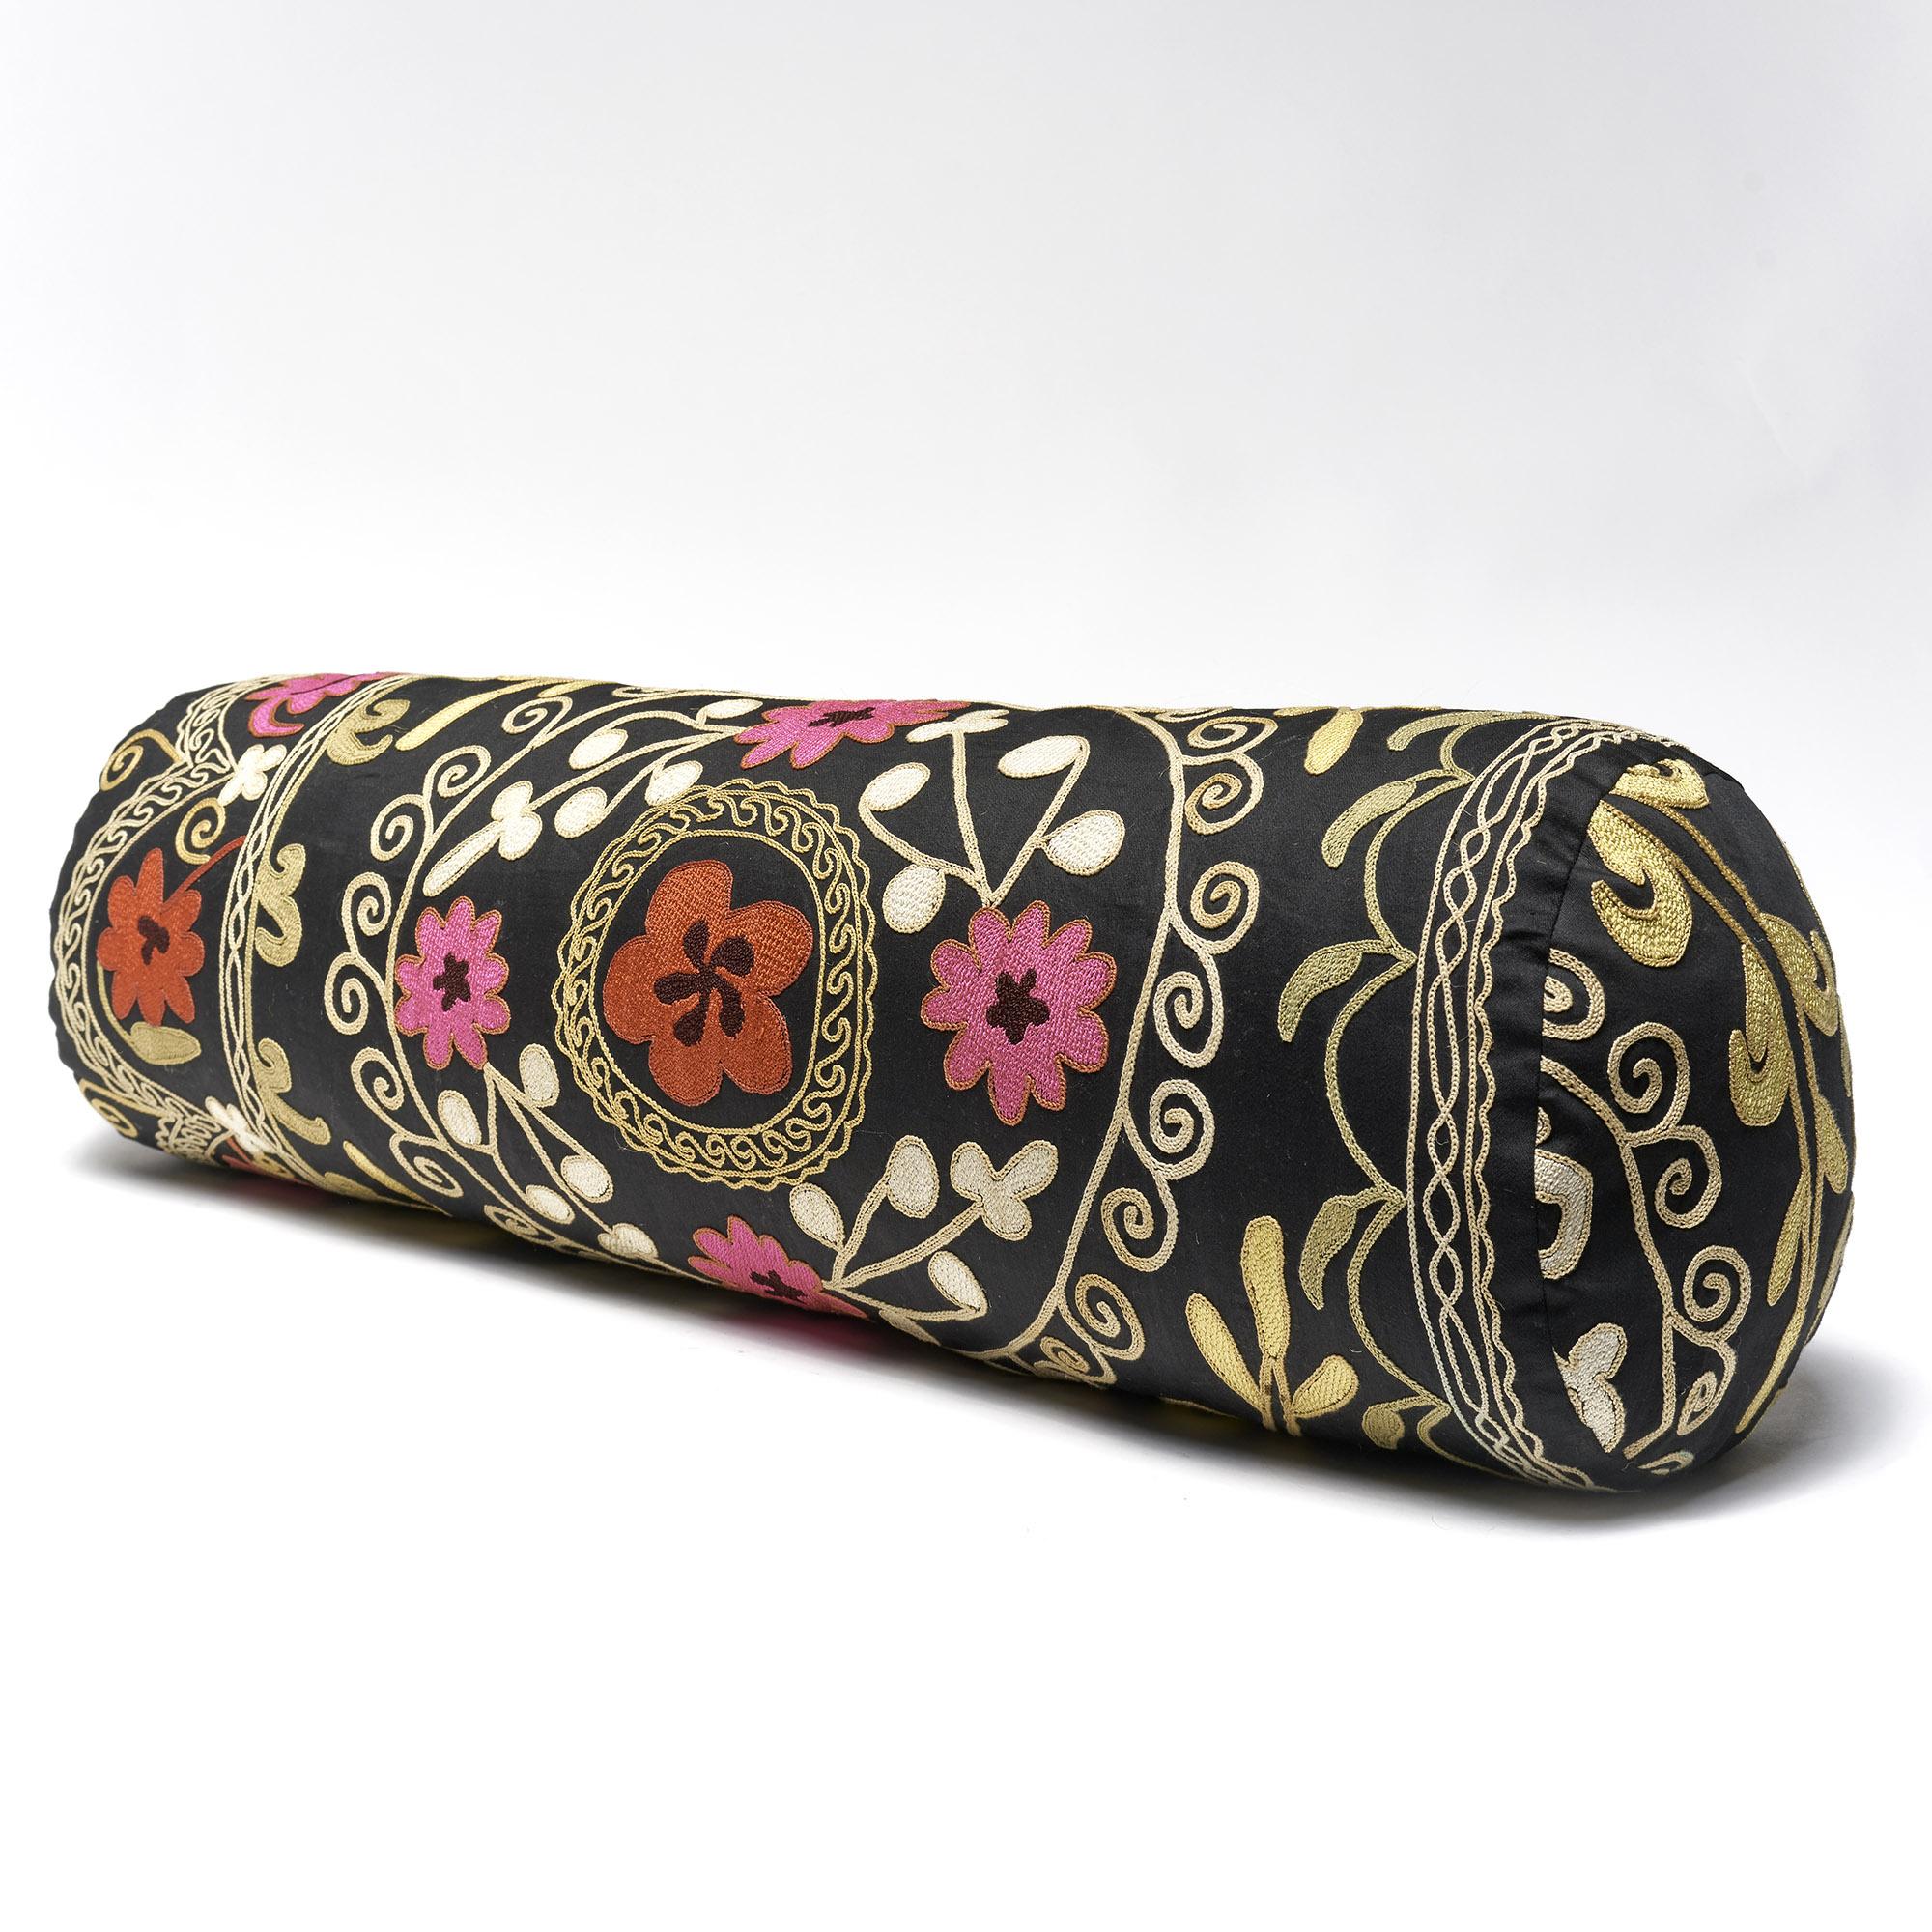 SALE! Almohadón rollo Suzani bordado a mano, negro con flores de colores